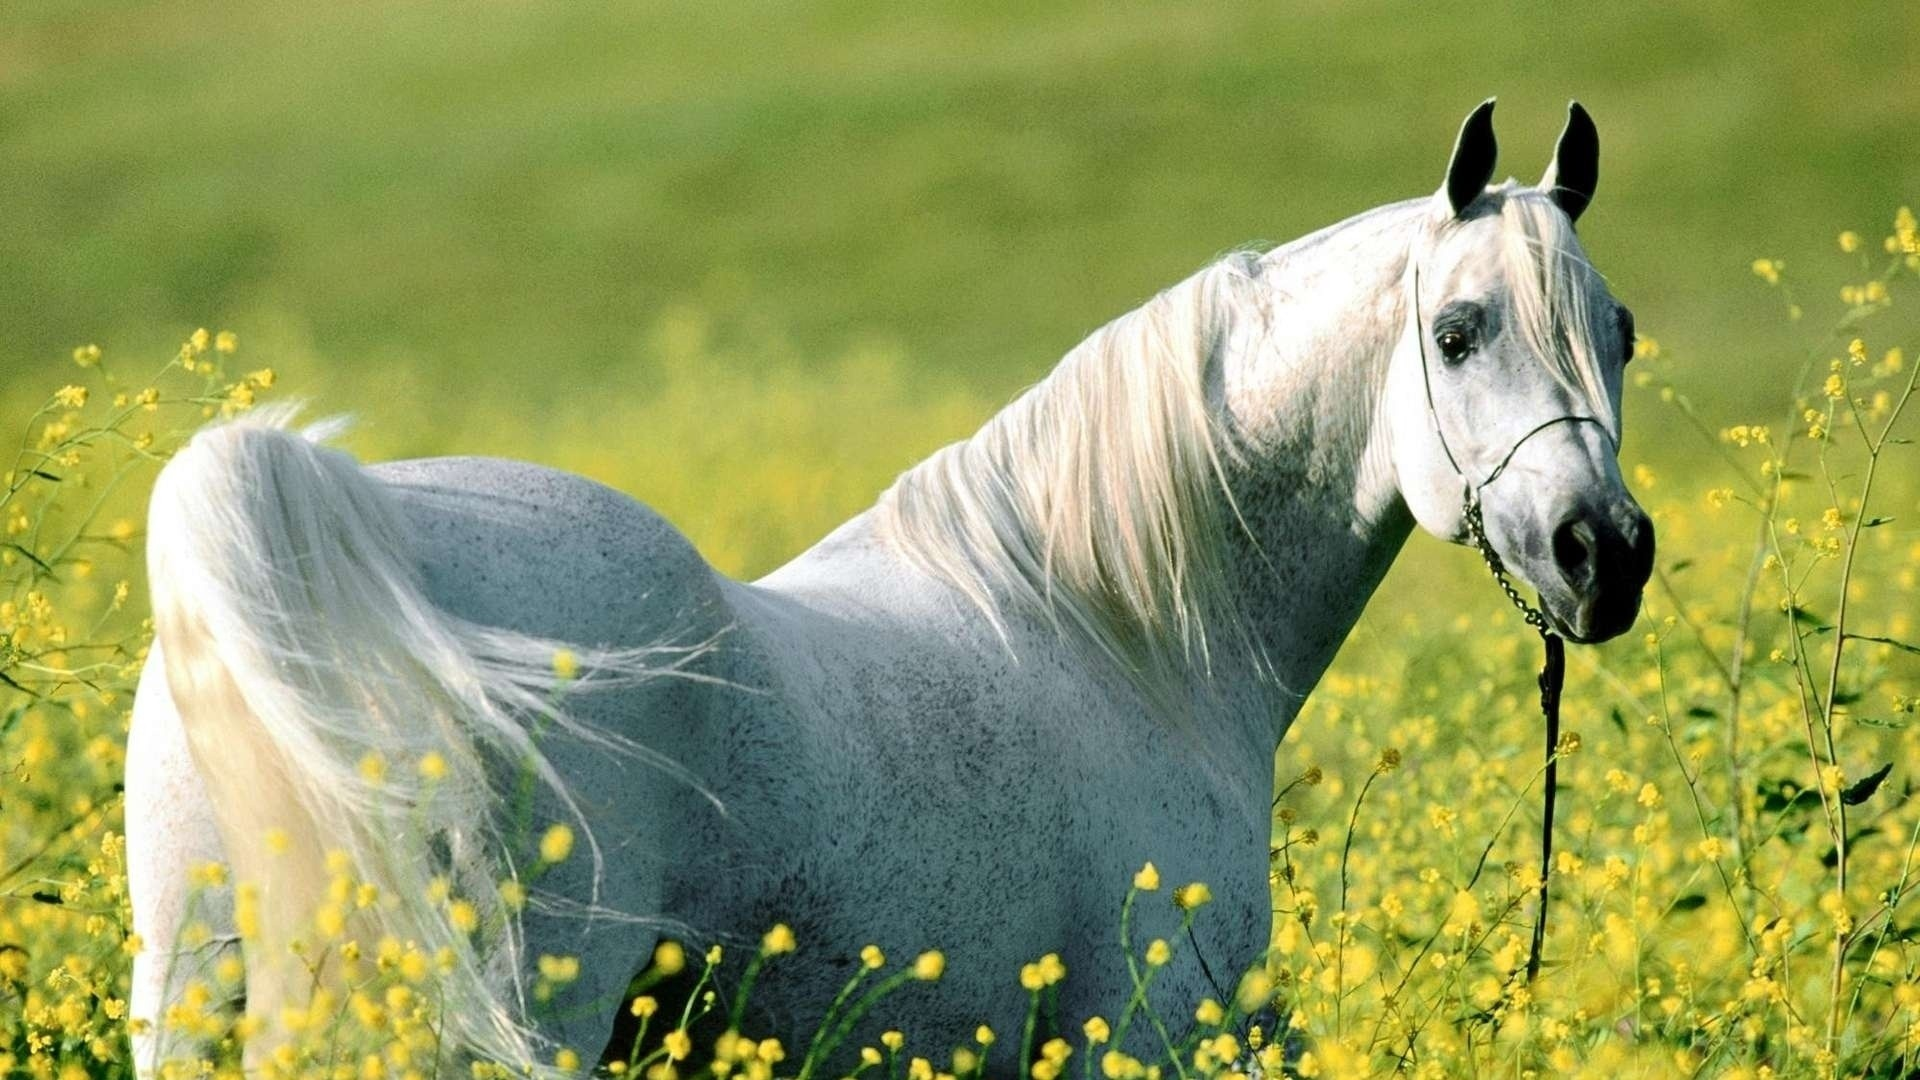 White Horse a wallpaper